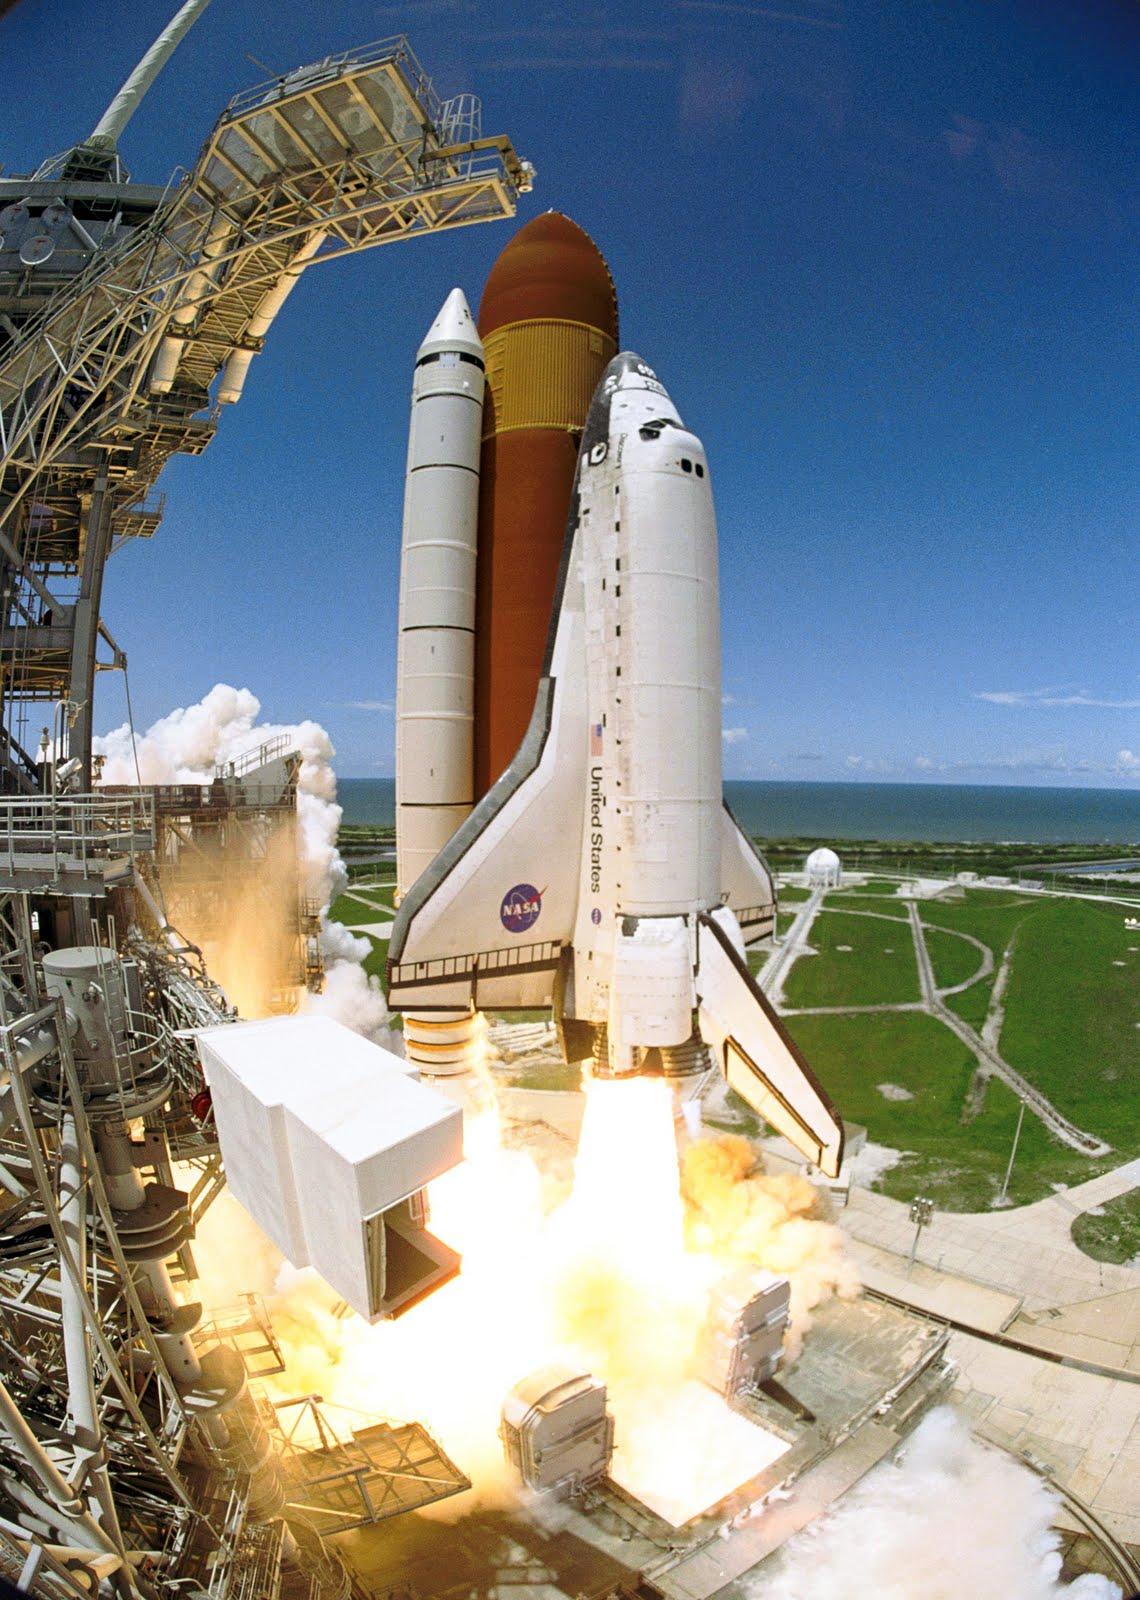 space shuttle - photo #19